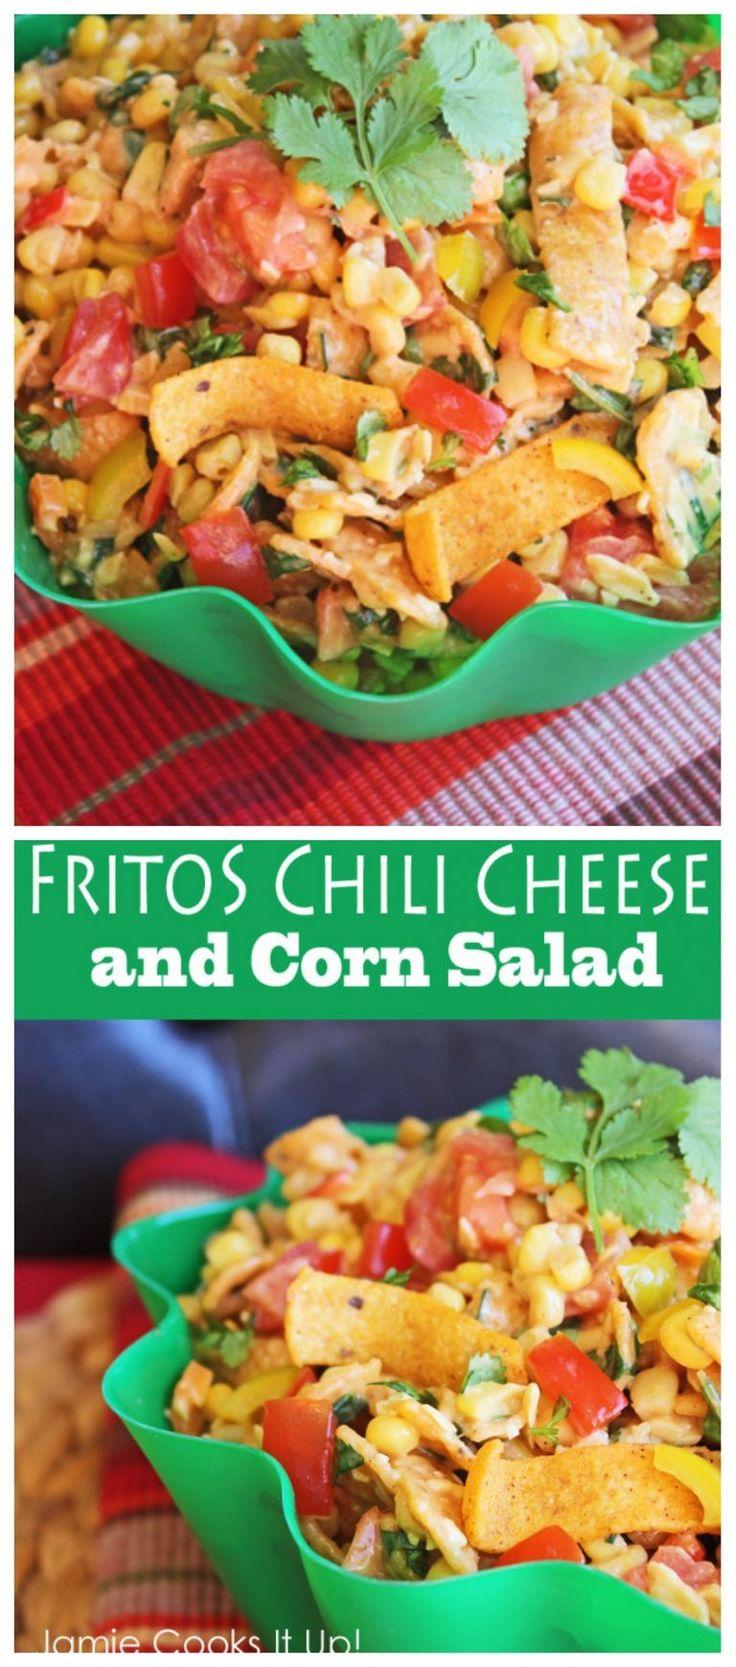 Corn Salad Recipe With Chili Cheese Fritos